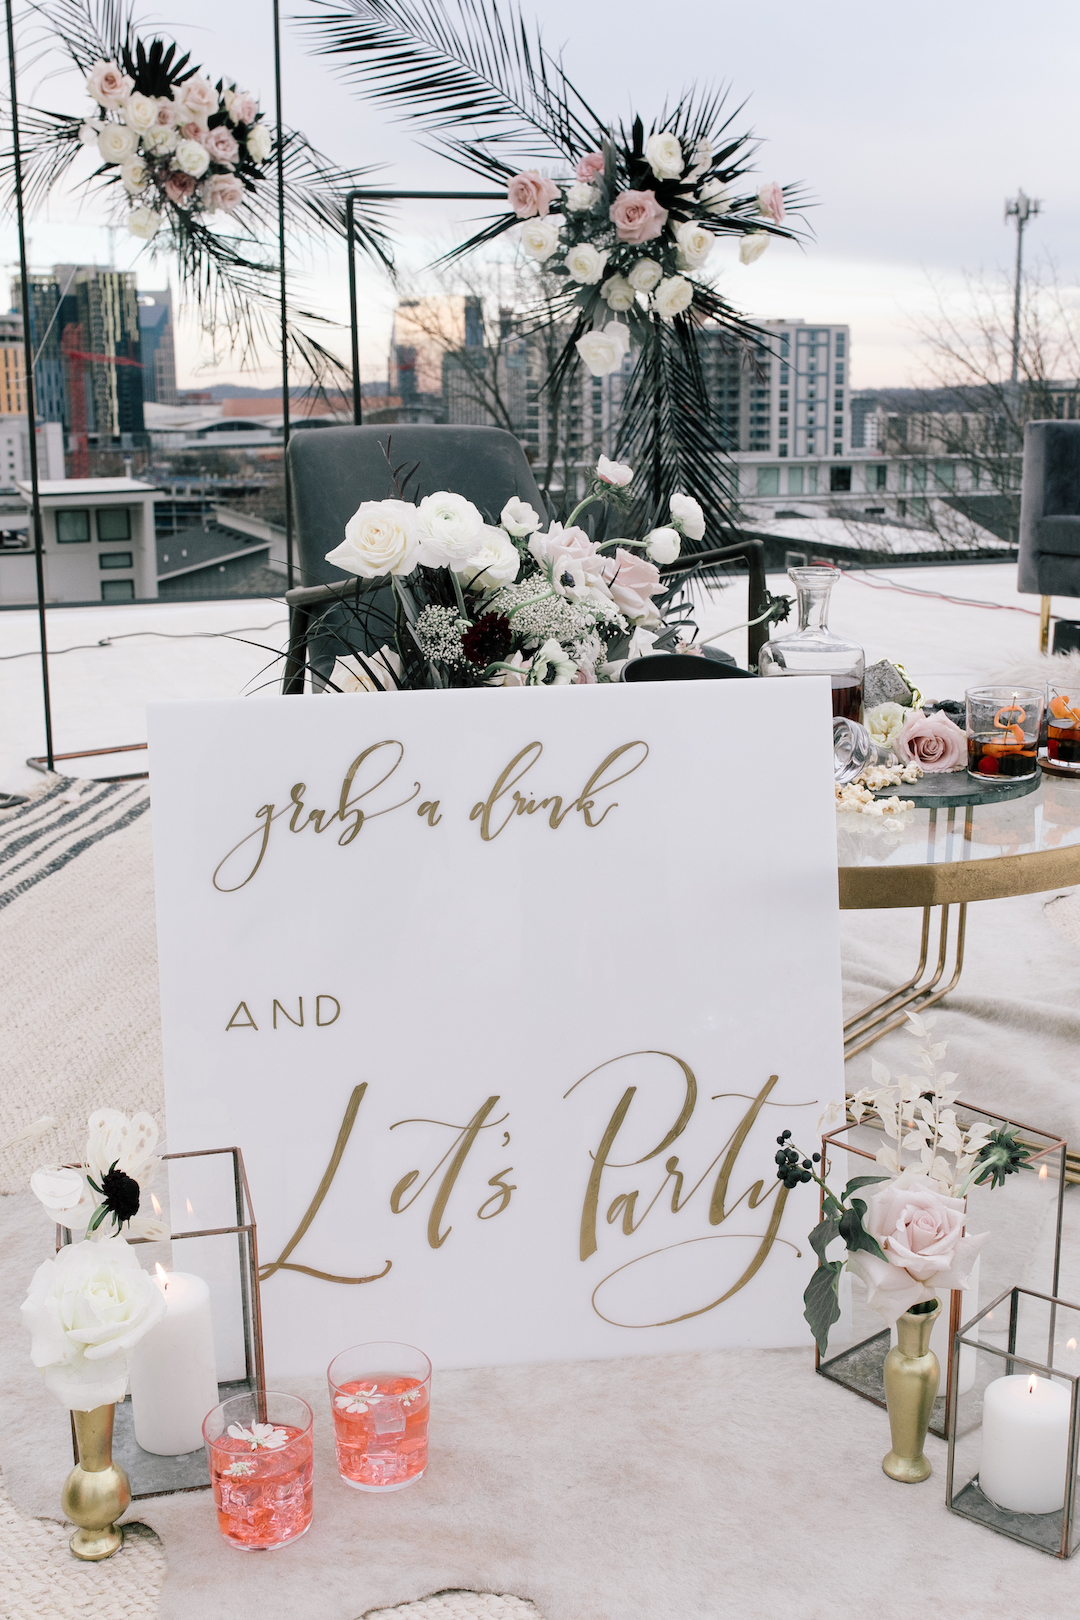 White Ink Calligraphy wedding sign | Nashville Bride Guide